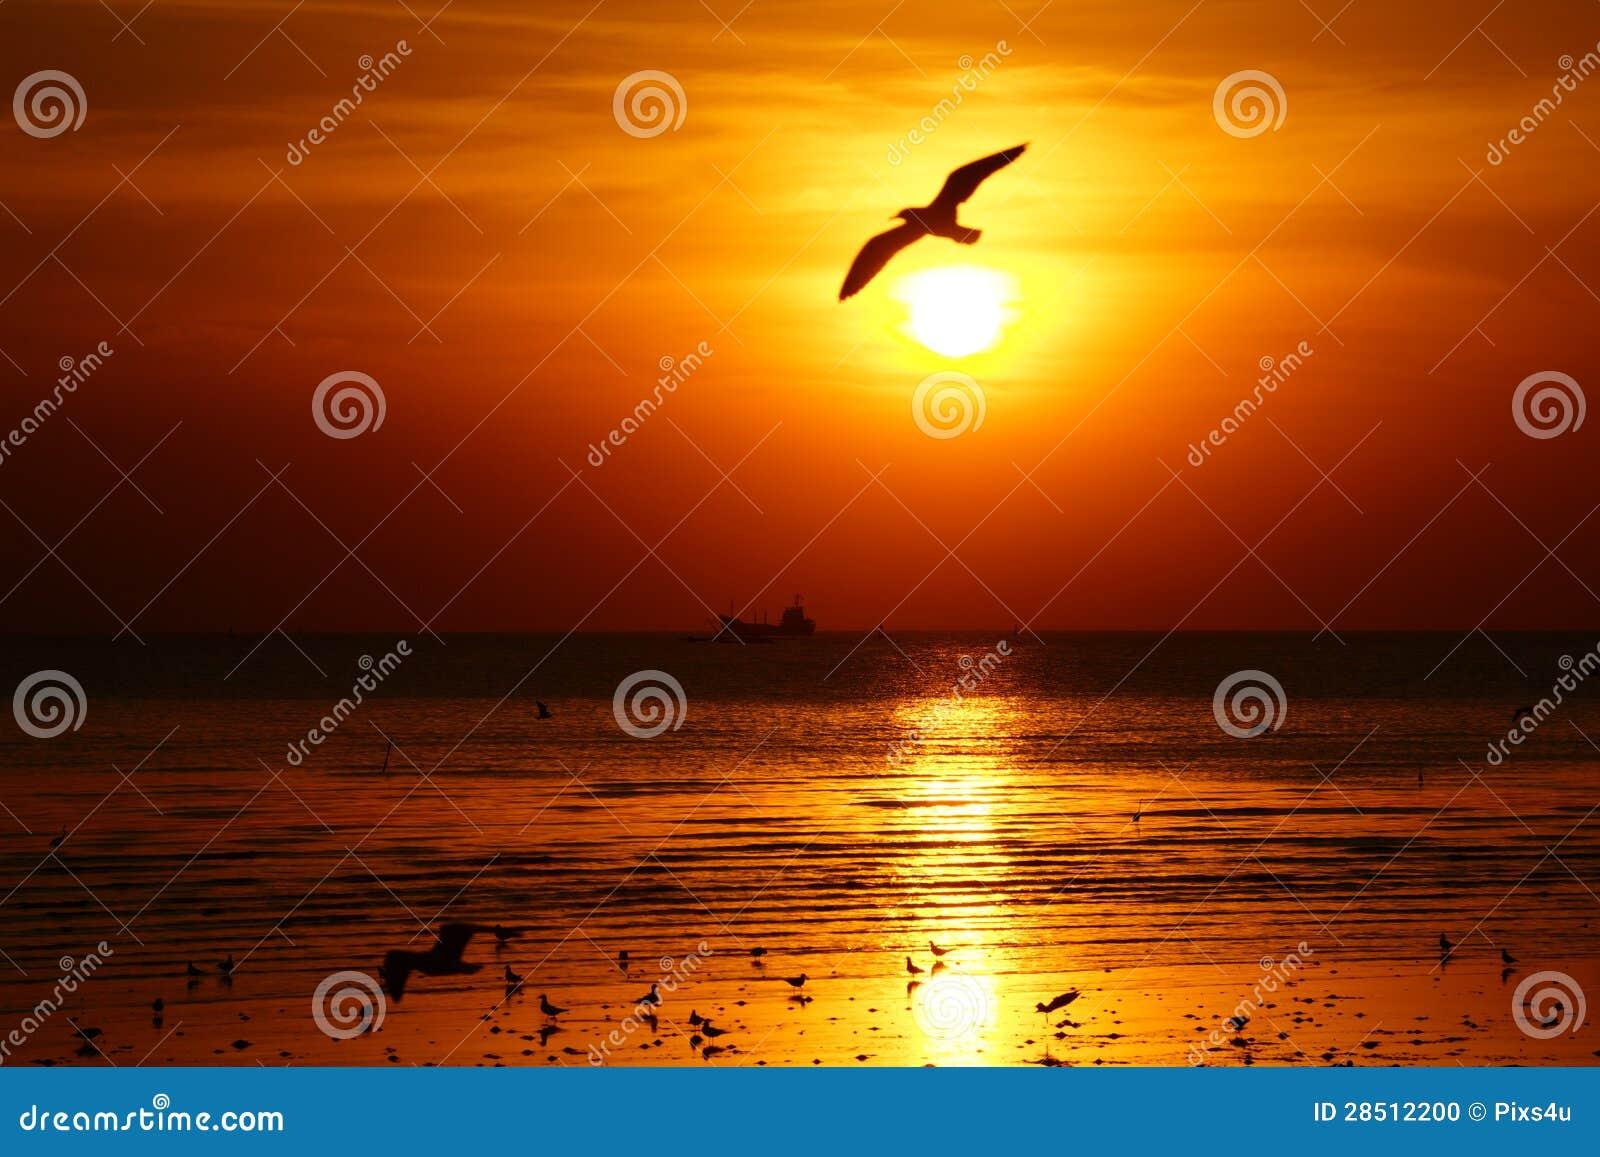 Силуэт чайки летая над океаном на заходе солнца